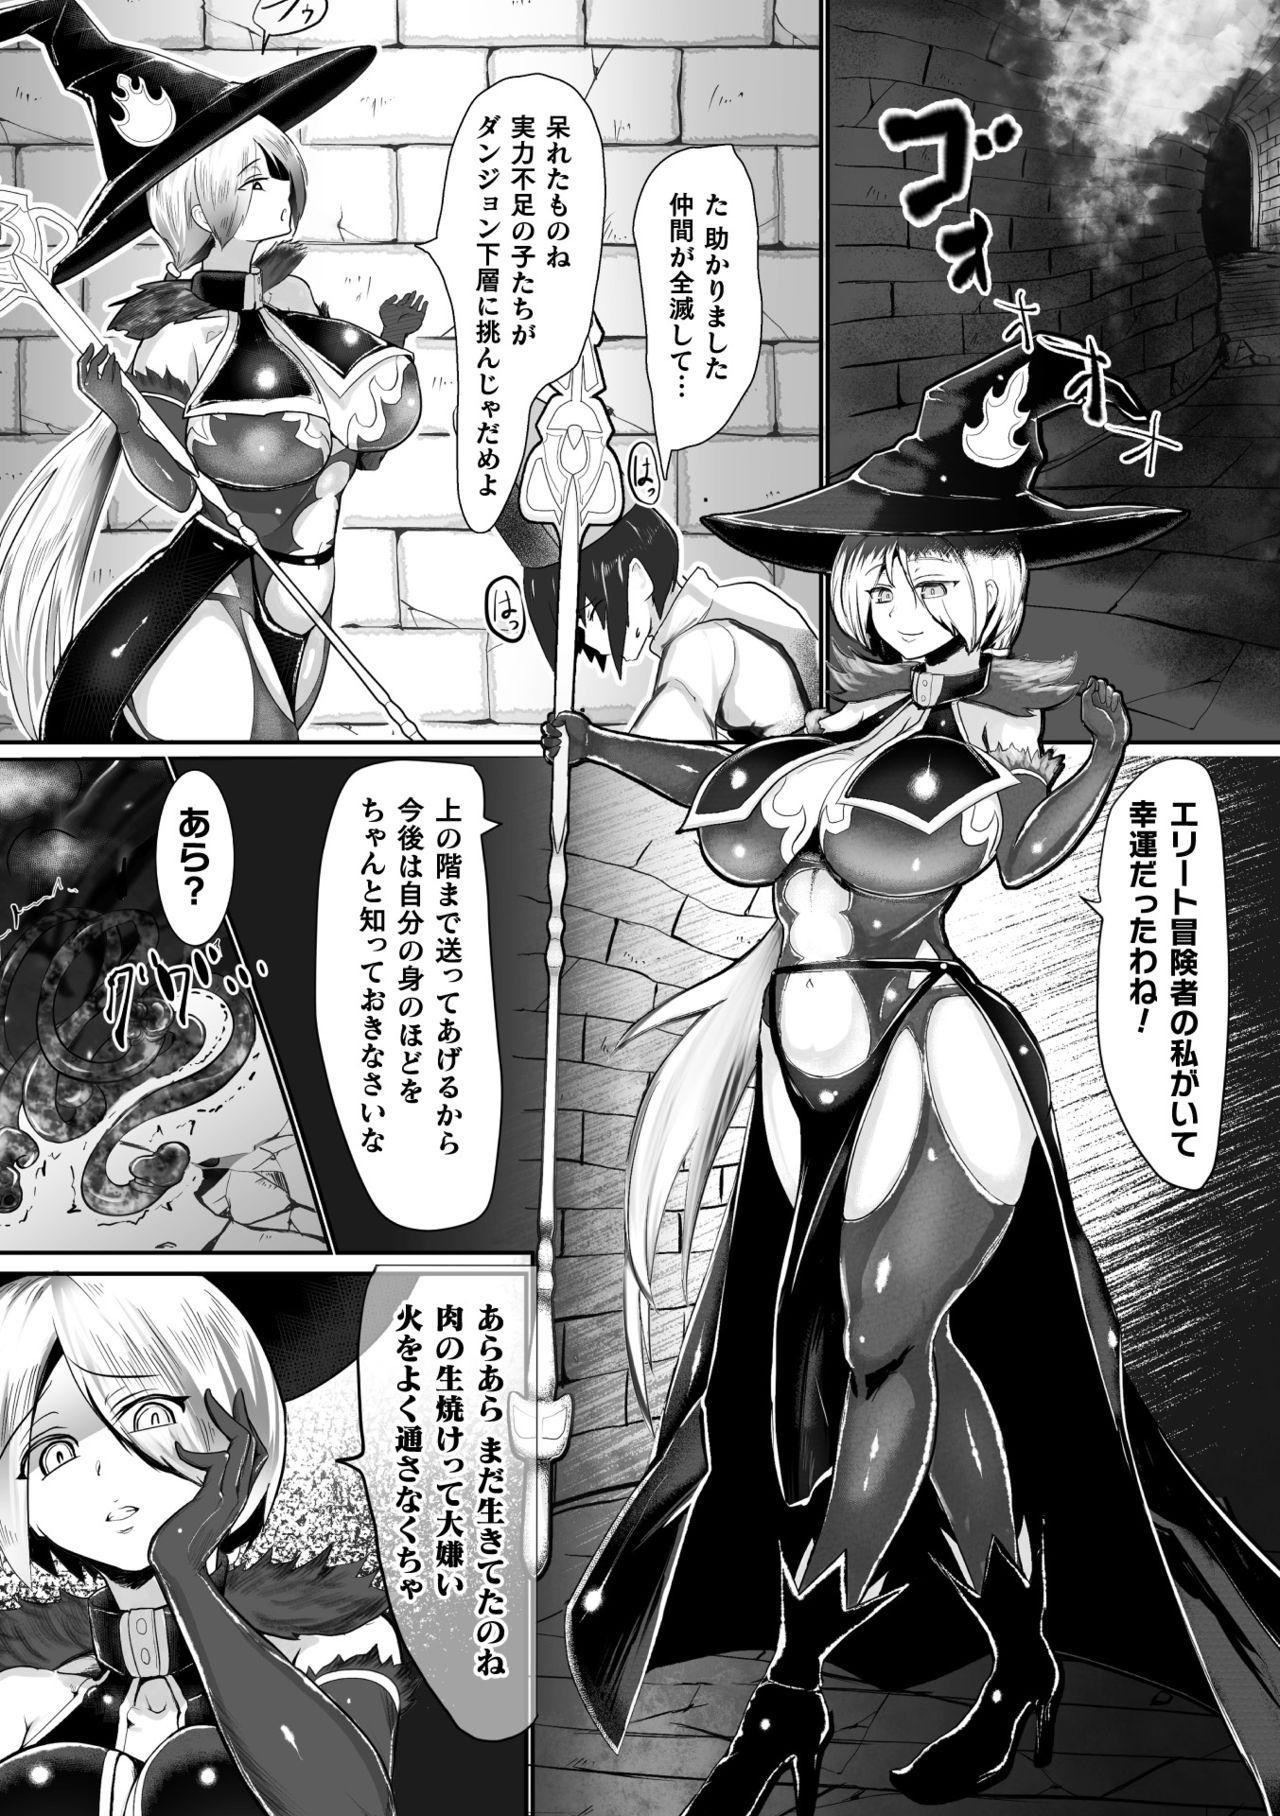 2D Comic Magazine Capsule Kan Seigi no Heroine Mesu Ochi Jikken! Vol. 2 49